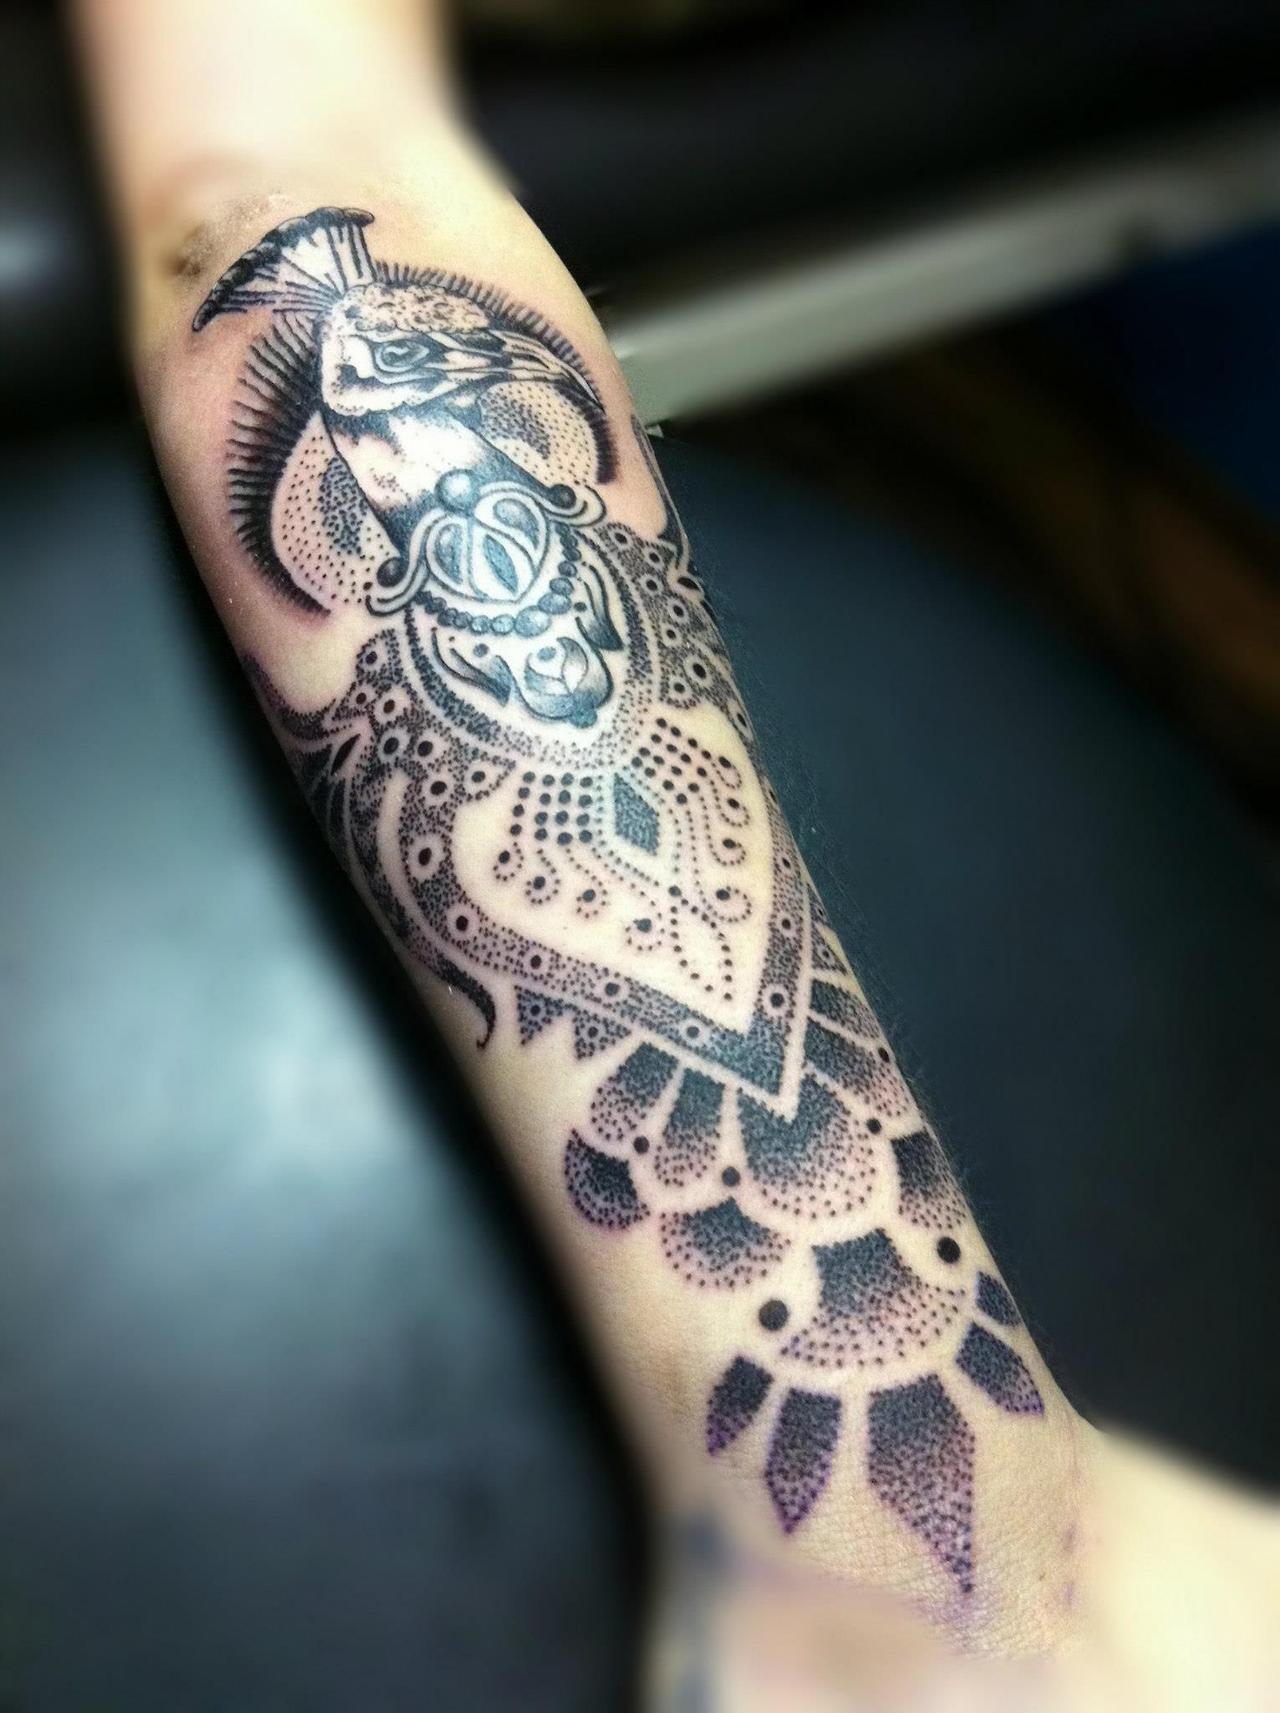 Mark Noel Tattoo Artist